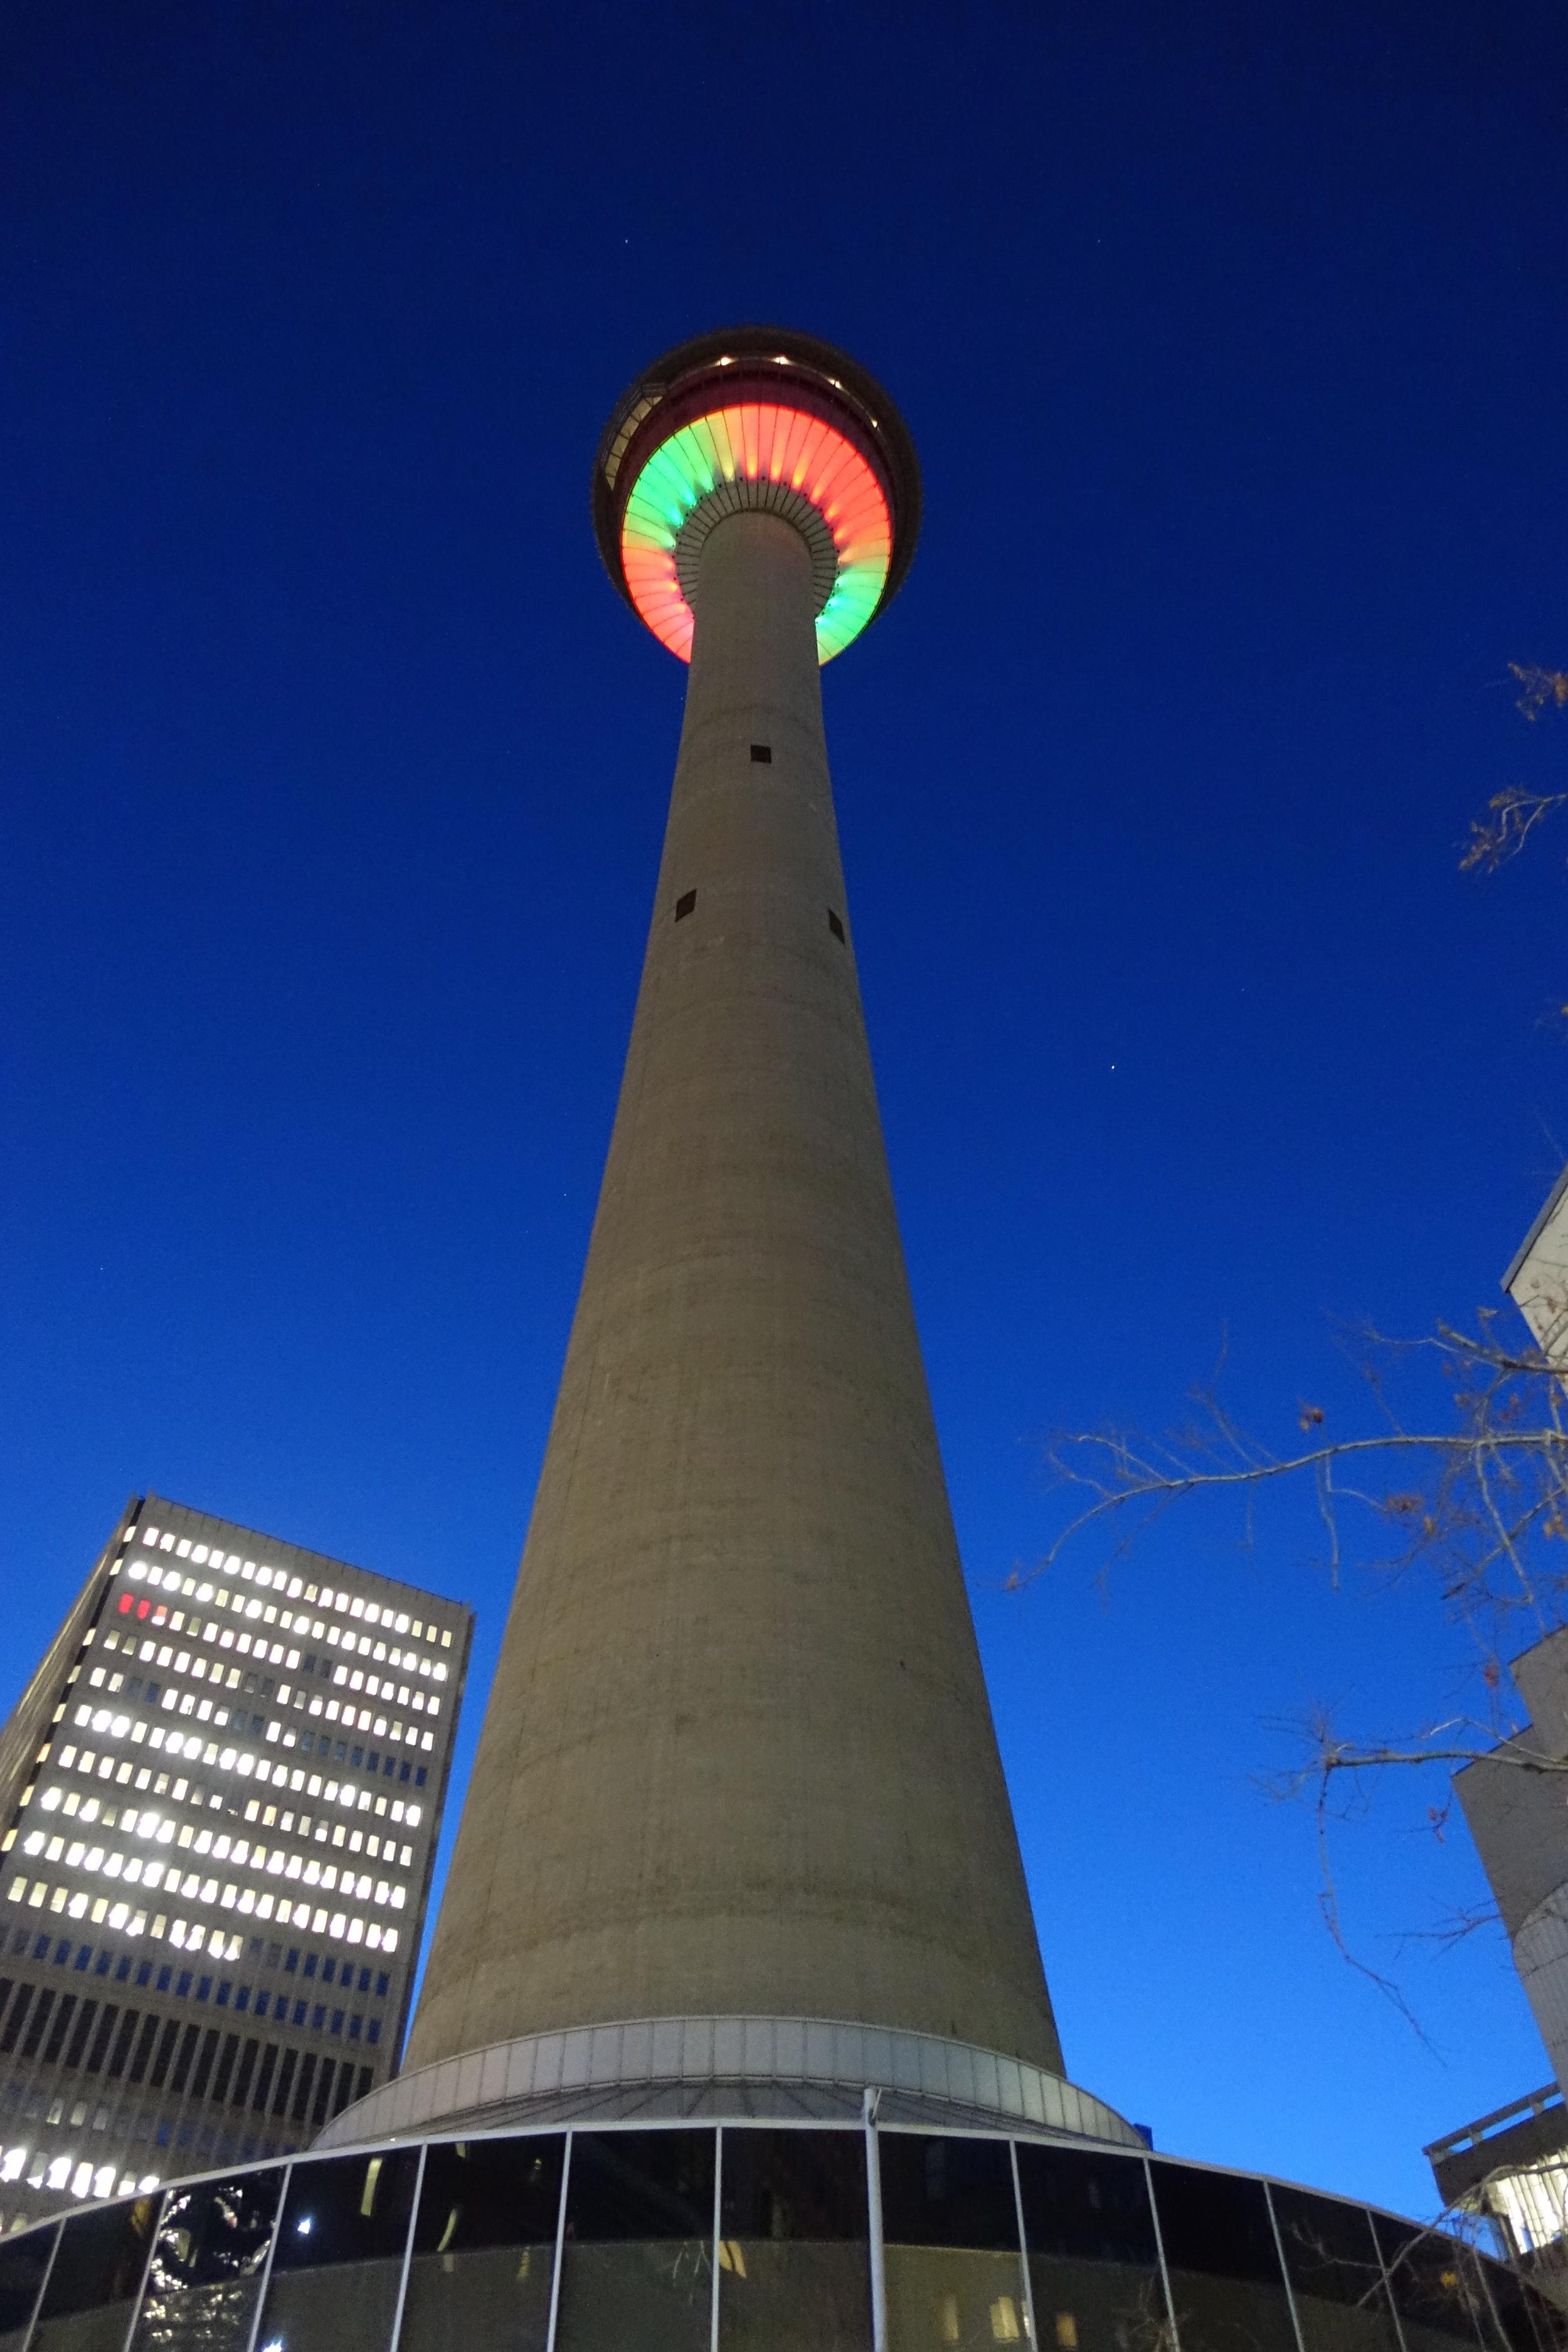 Calgary Tower revolving restaurant lighting at dawn.